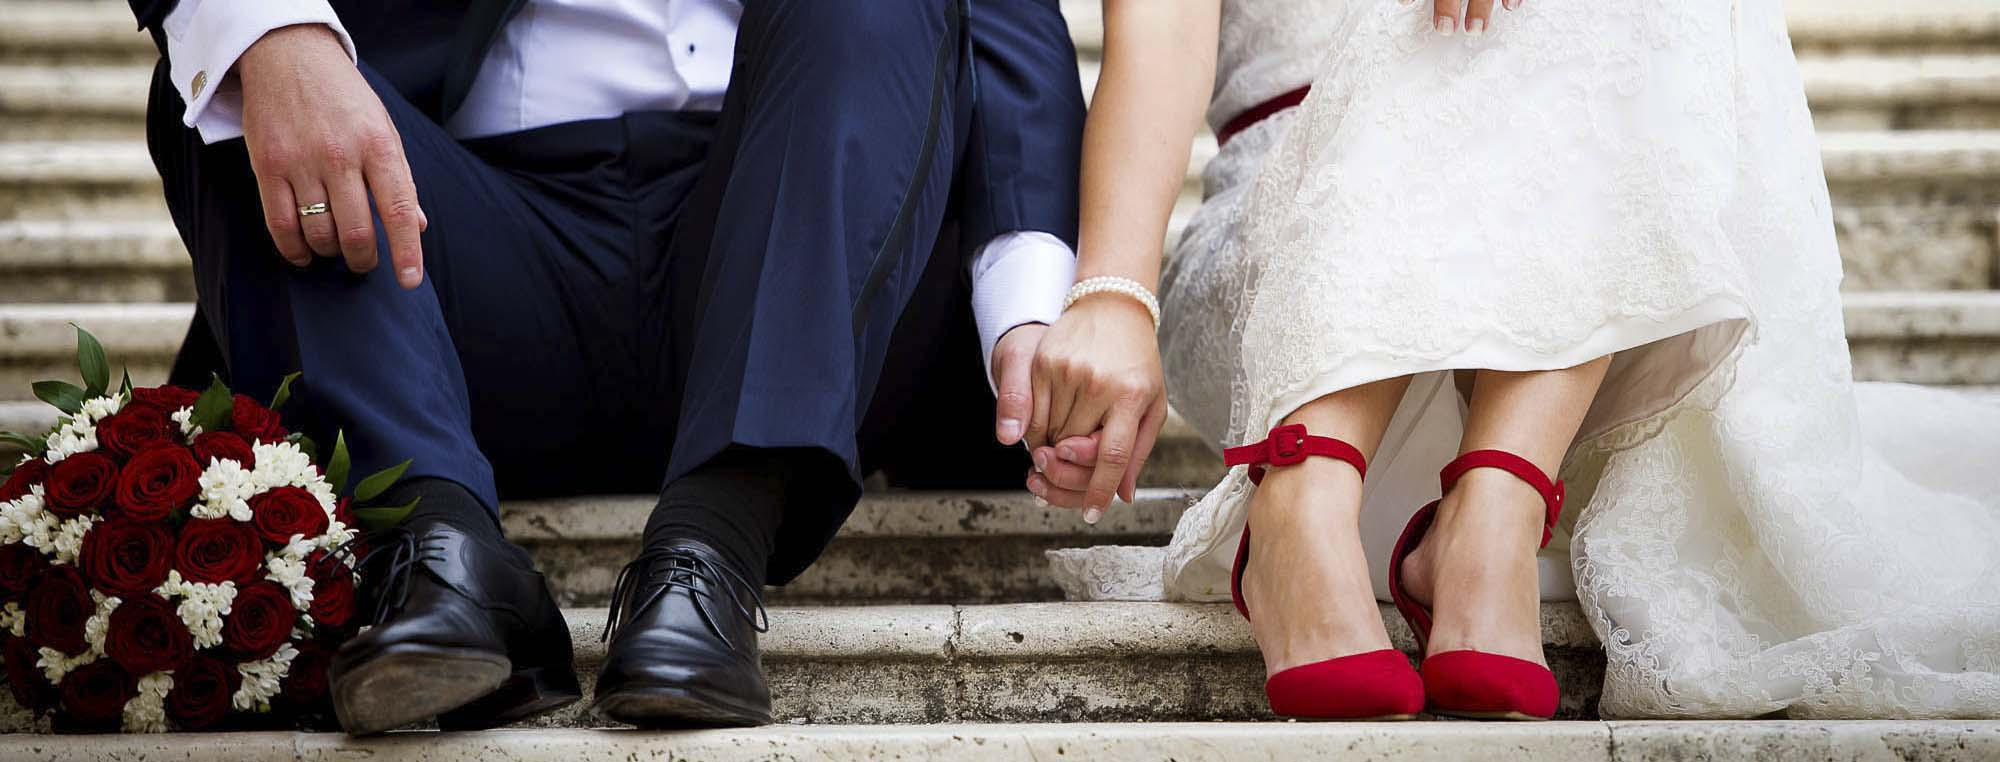 Matrimonio Streaming Vercelli